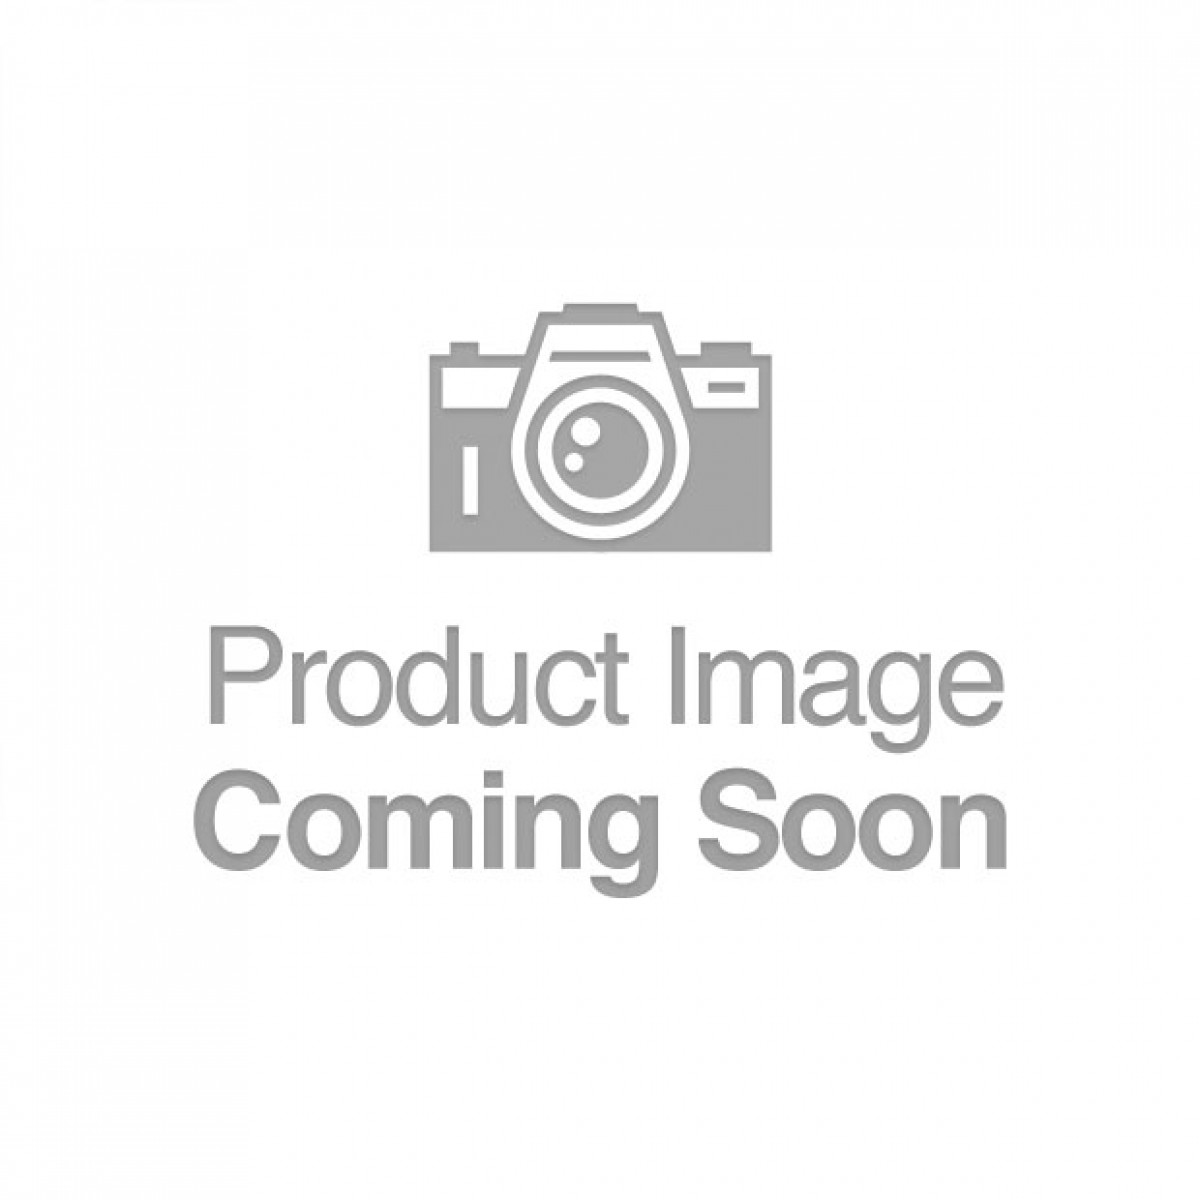 Nexus Enduro Plus Silicone Cock Ring - Black